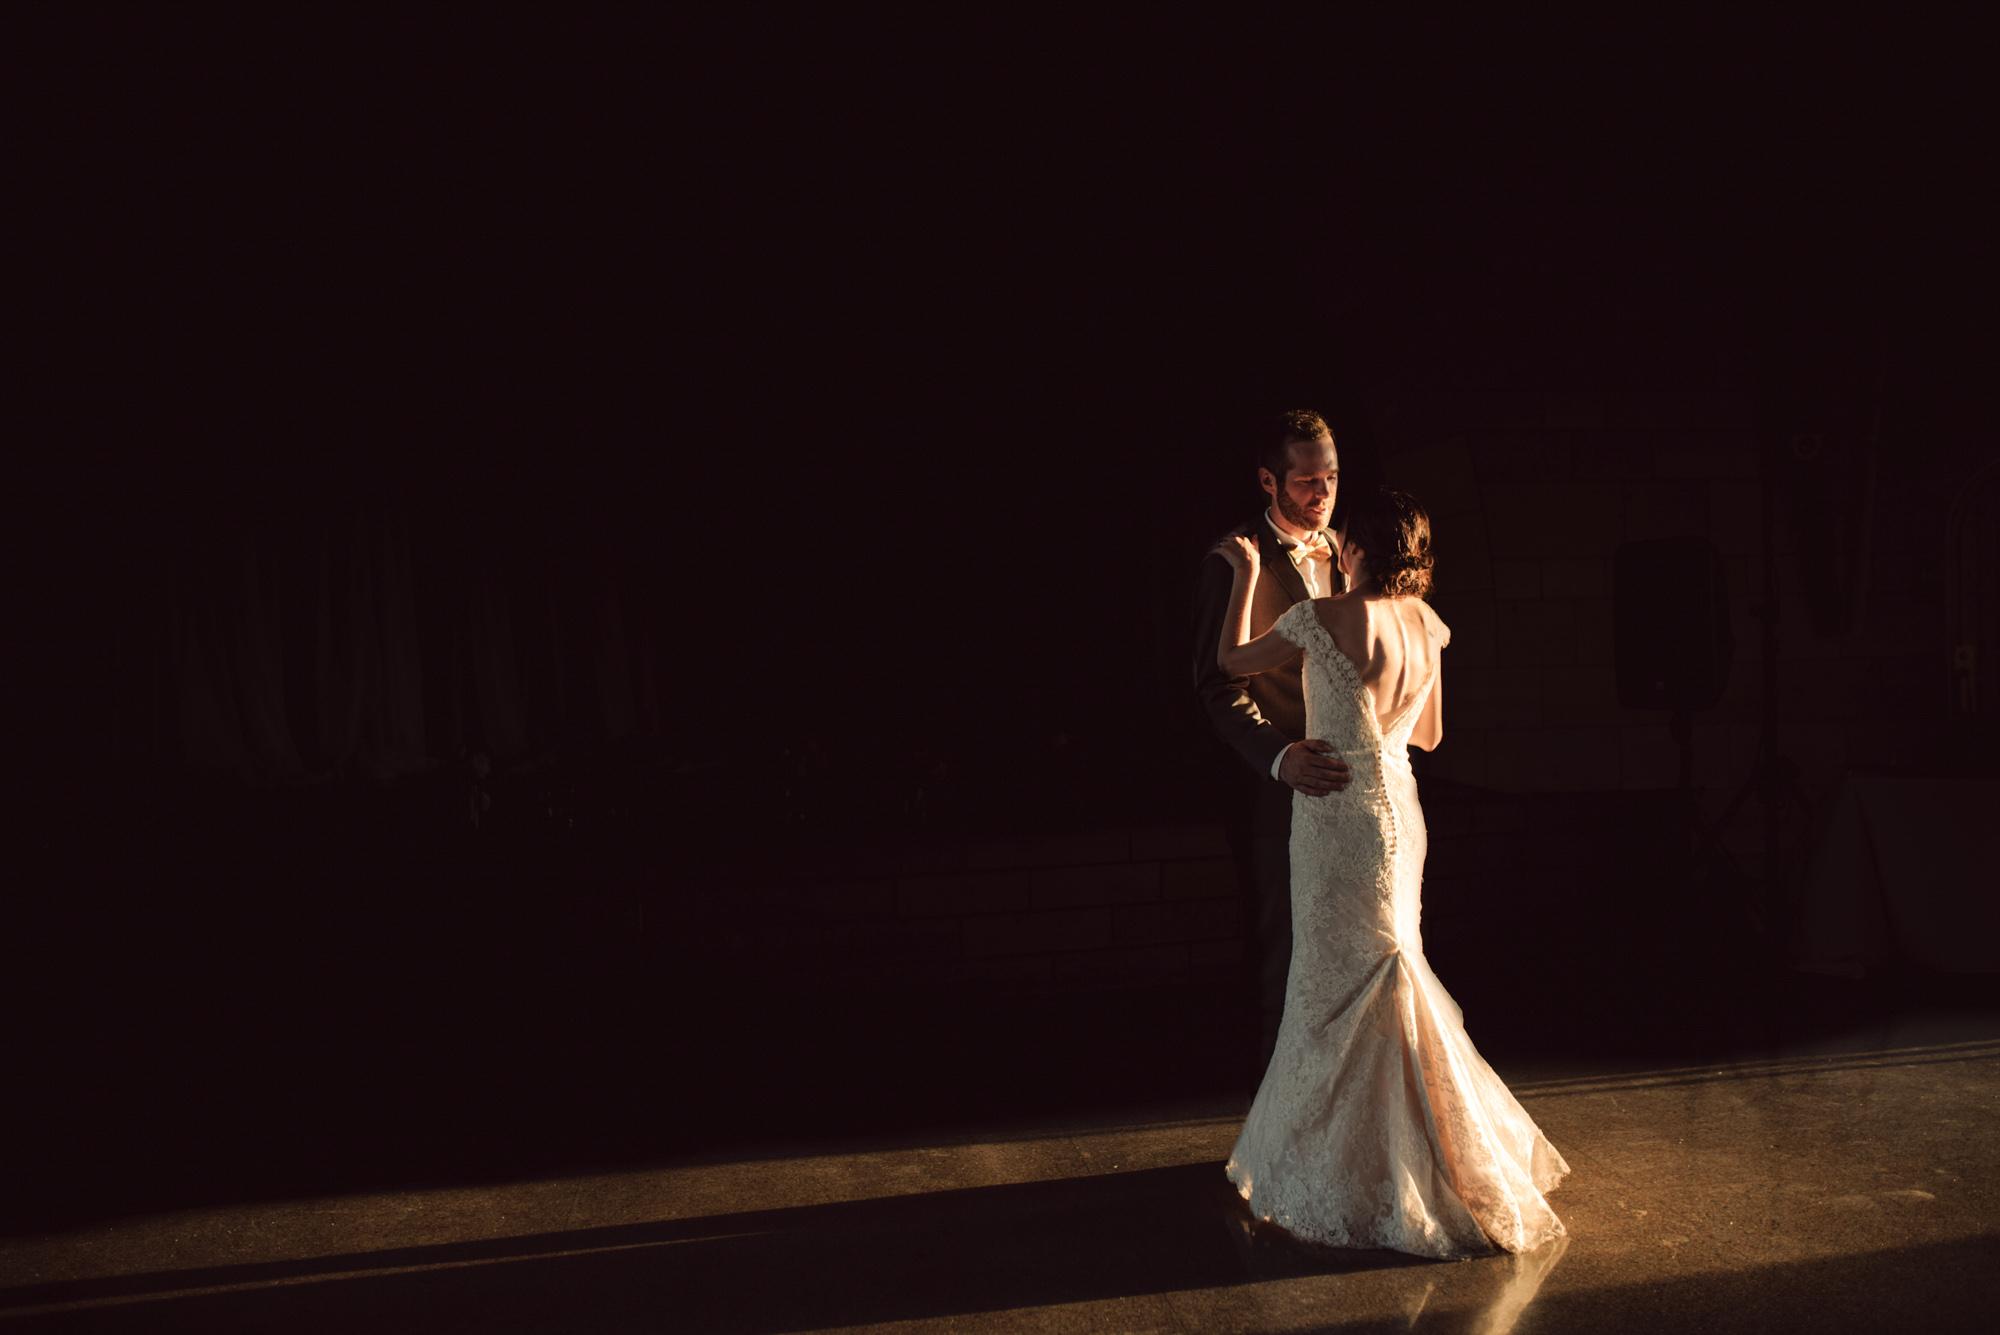 harriet-island-wedding-photographer-1-42.jpg